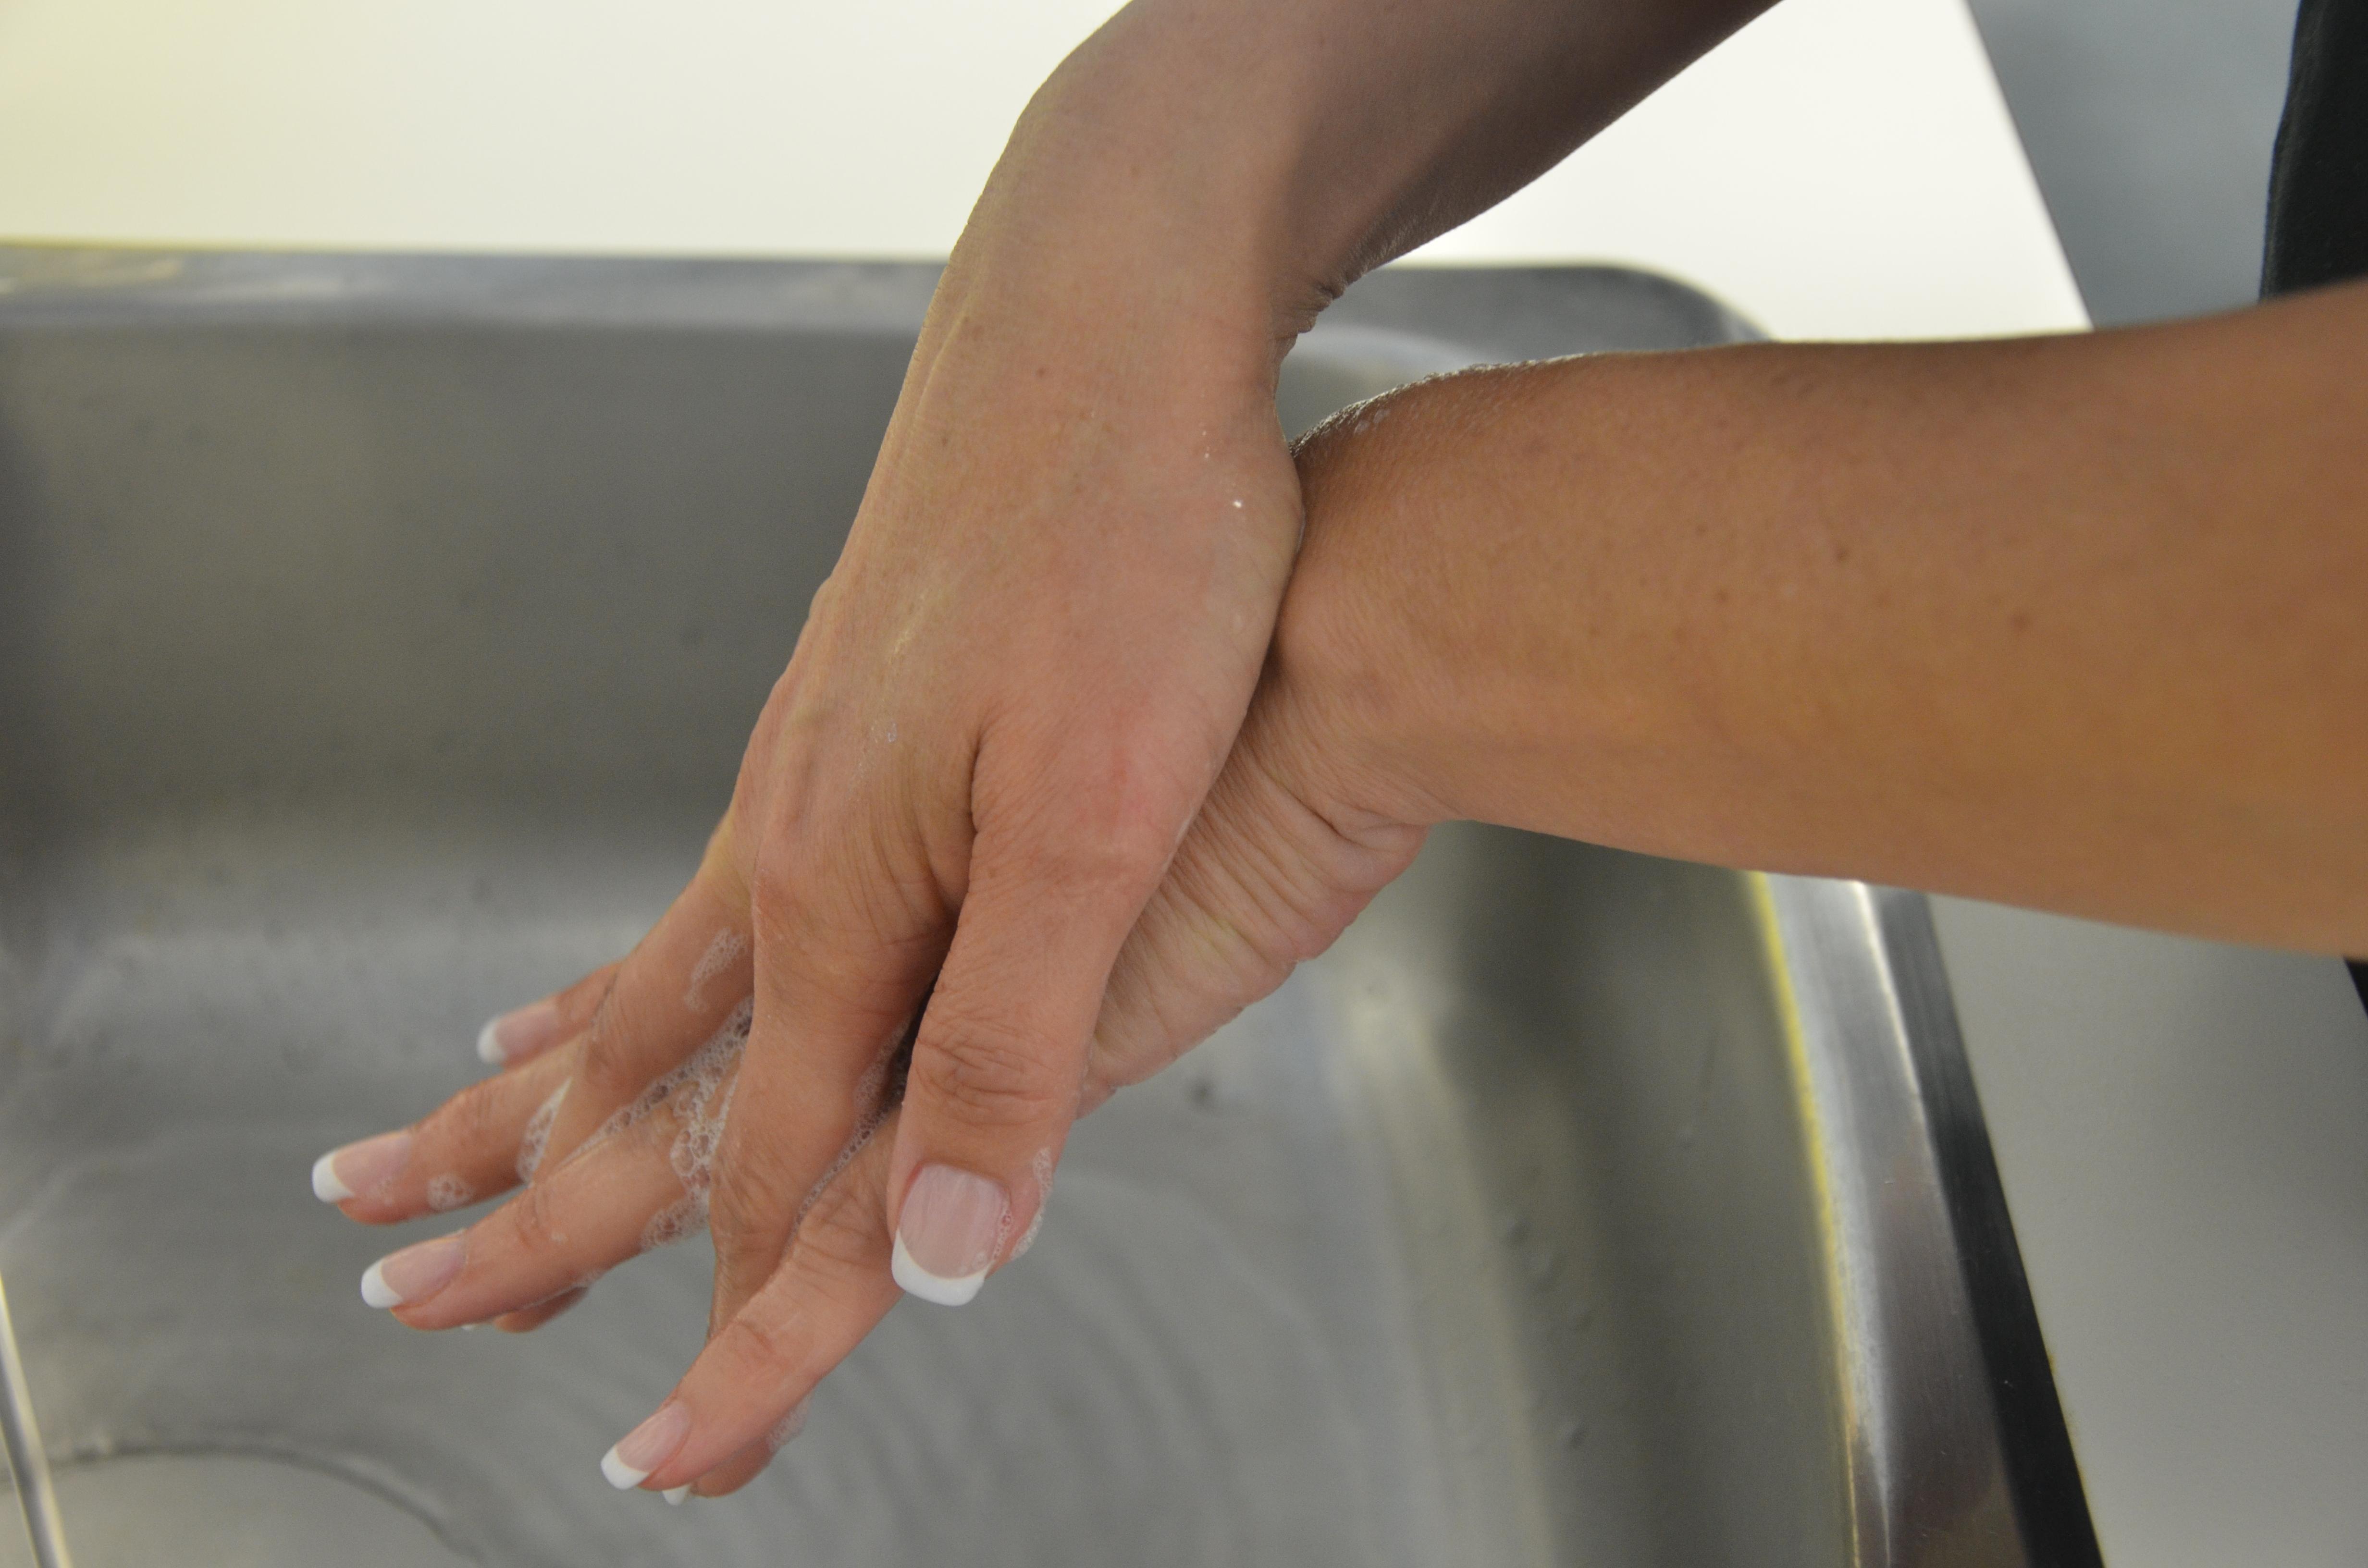 how to help soithe a burn on finger